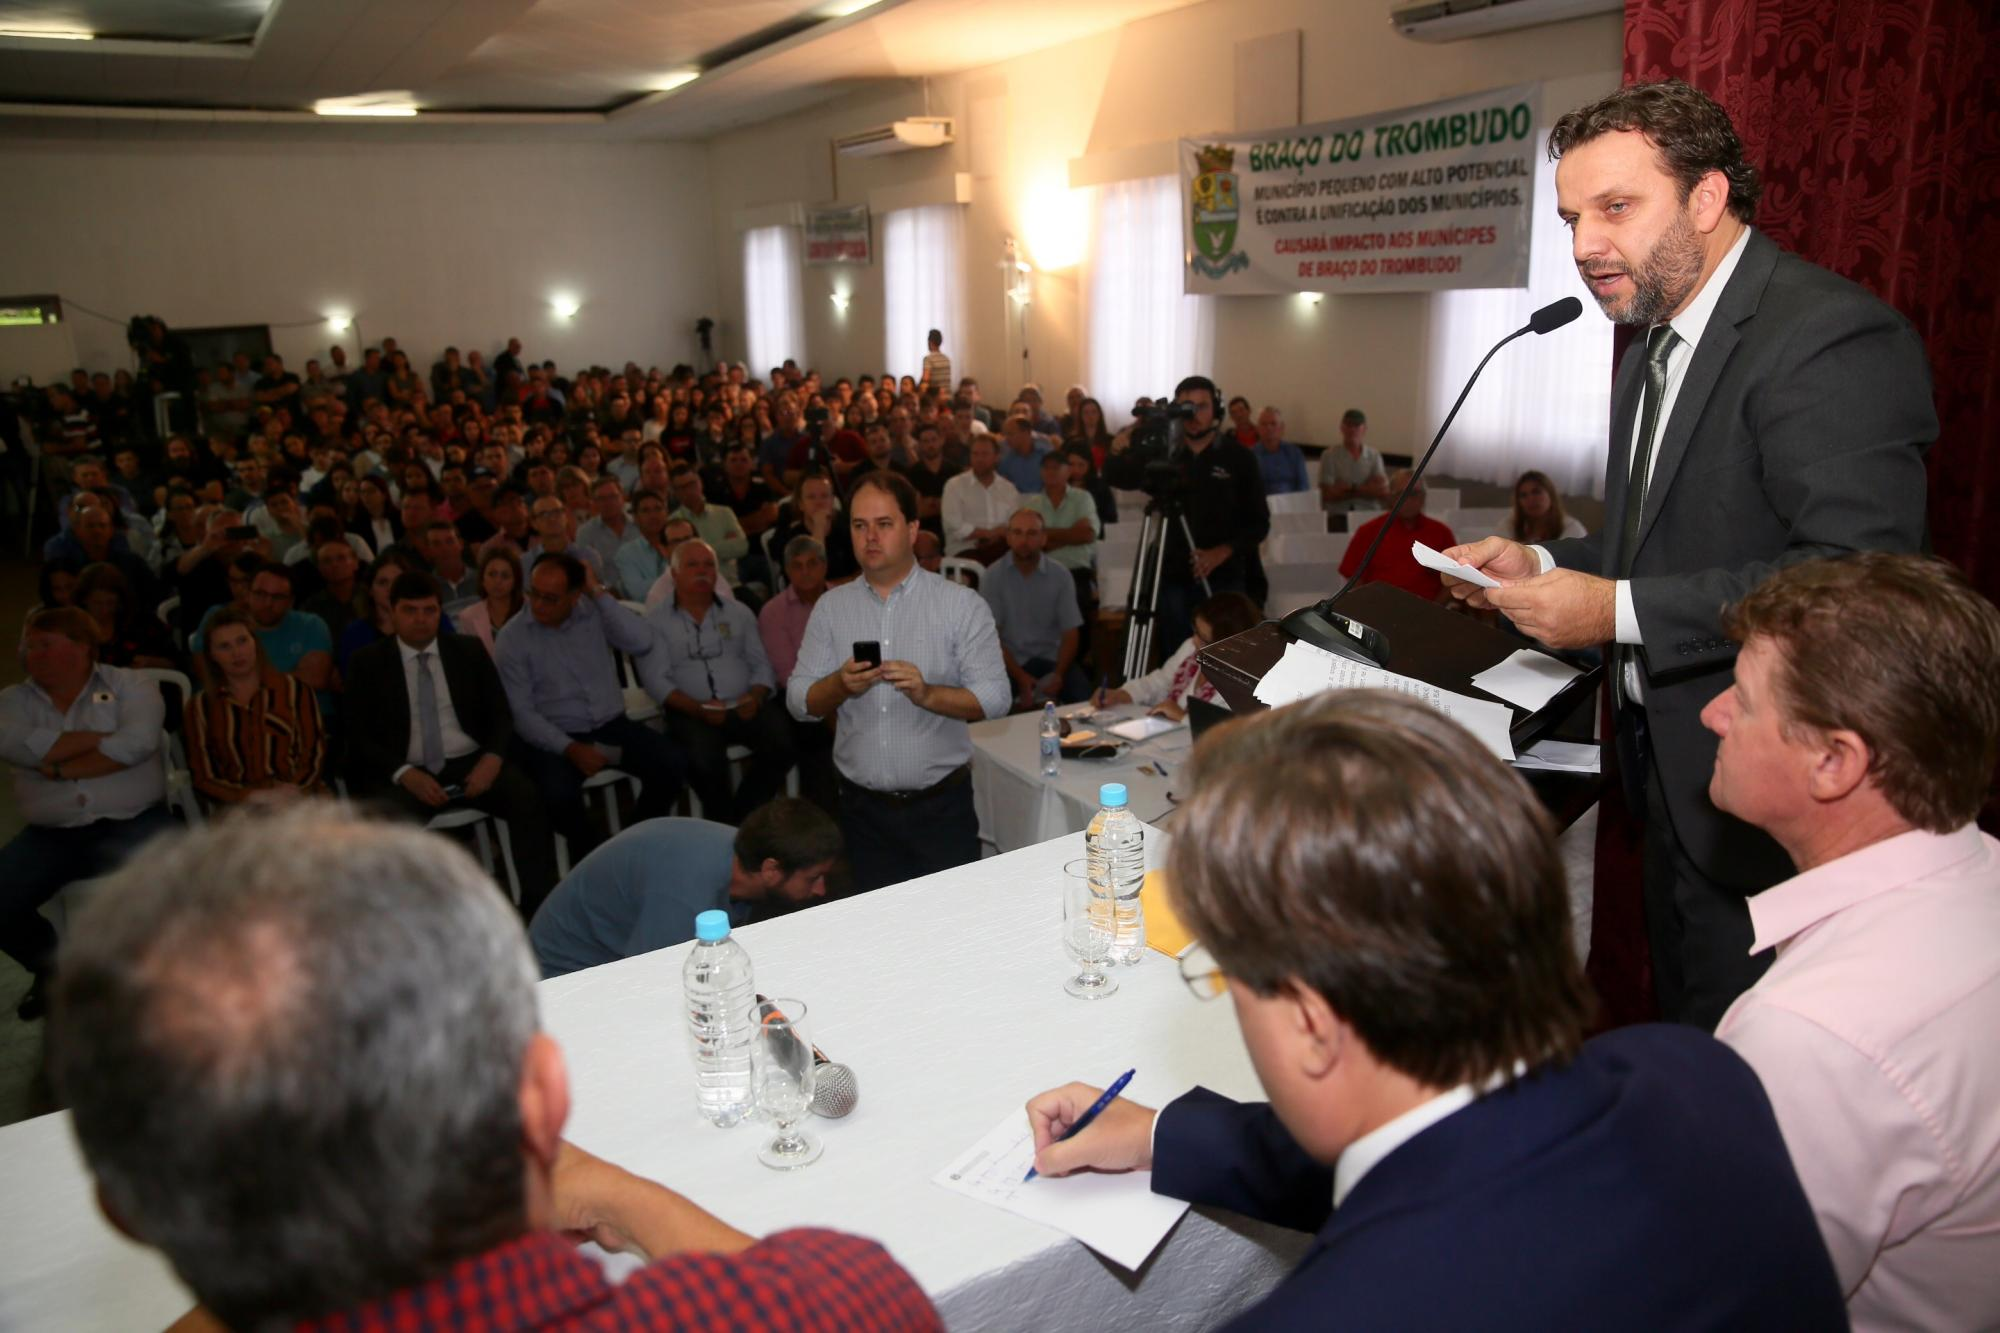 Projeto de lei propõe aumentar repasse de recursos do ICMS aos pequenos municípios